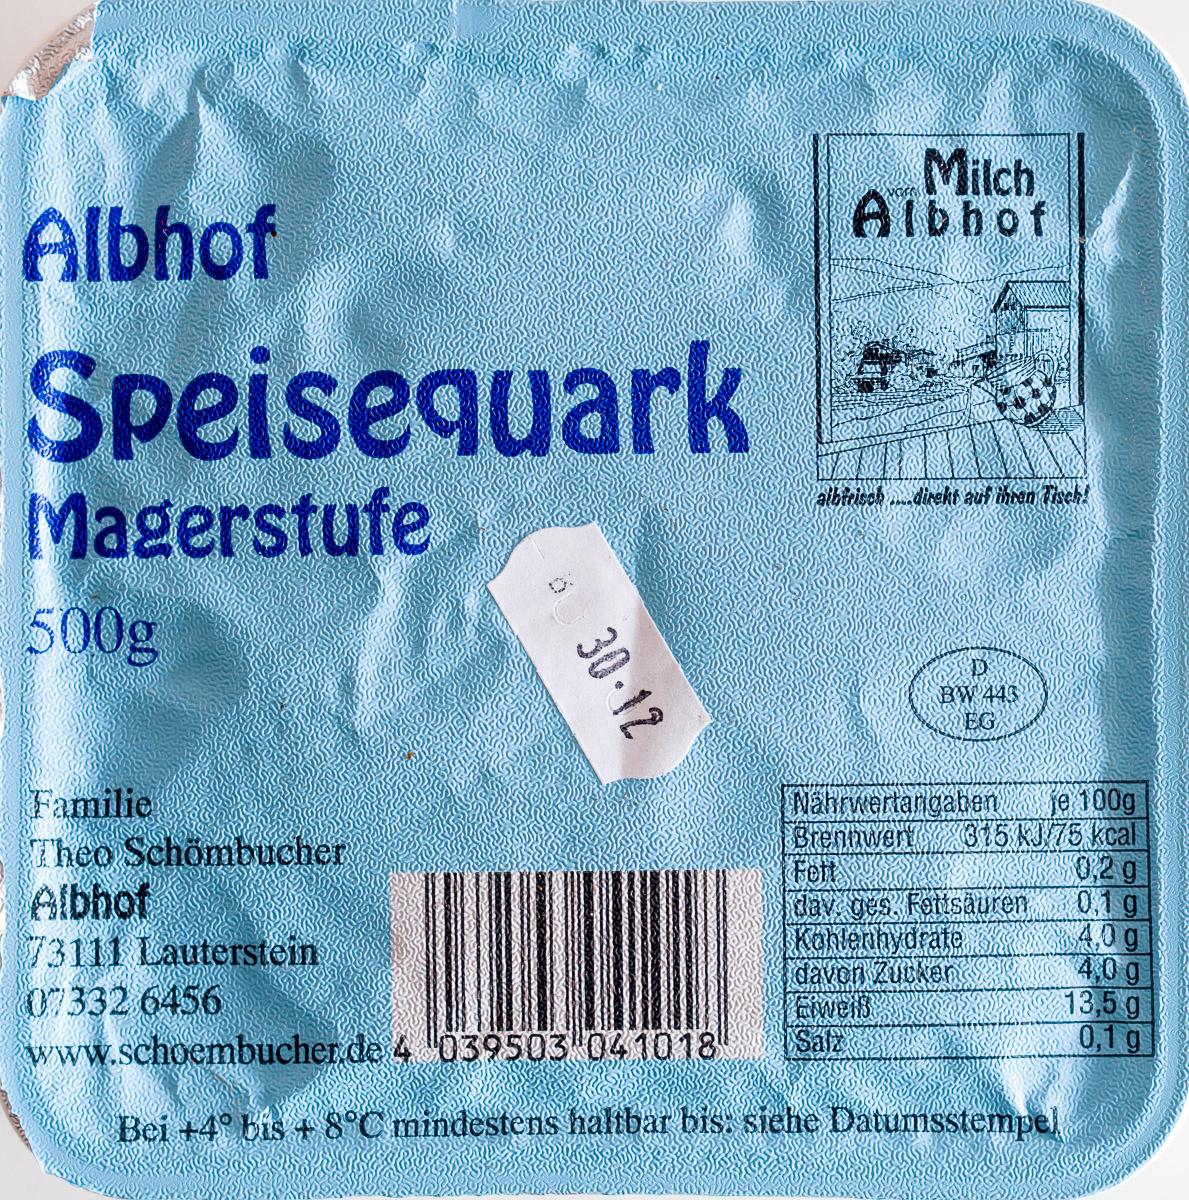 Speisequark Magerstufe - Produit - de